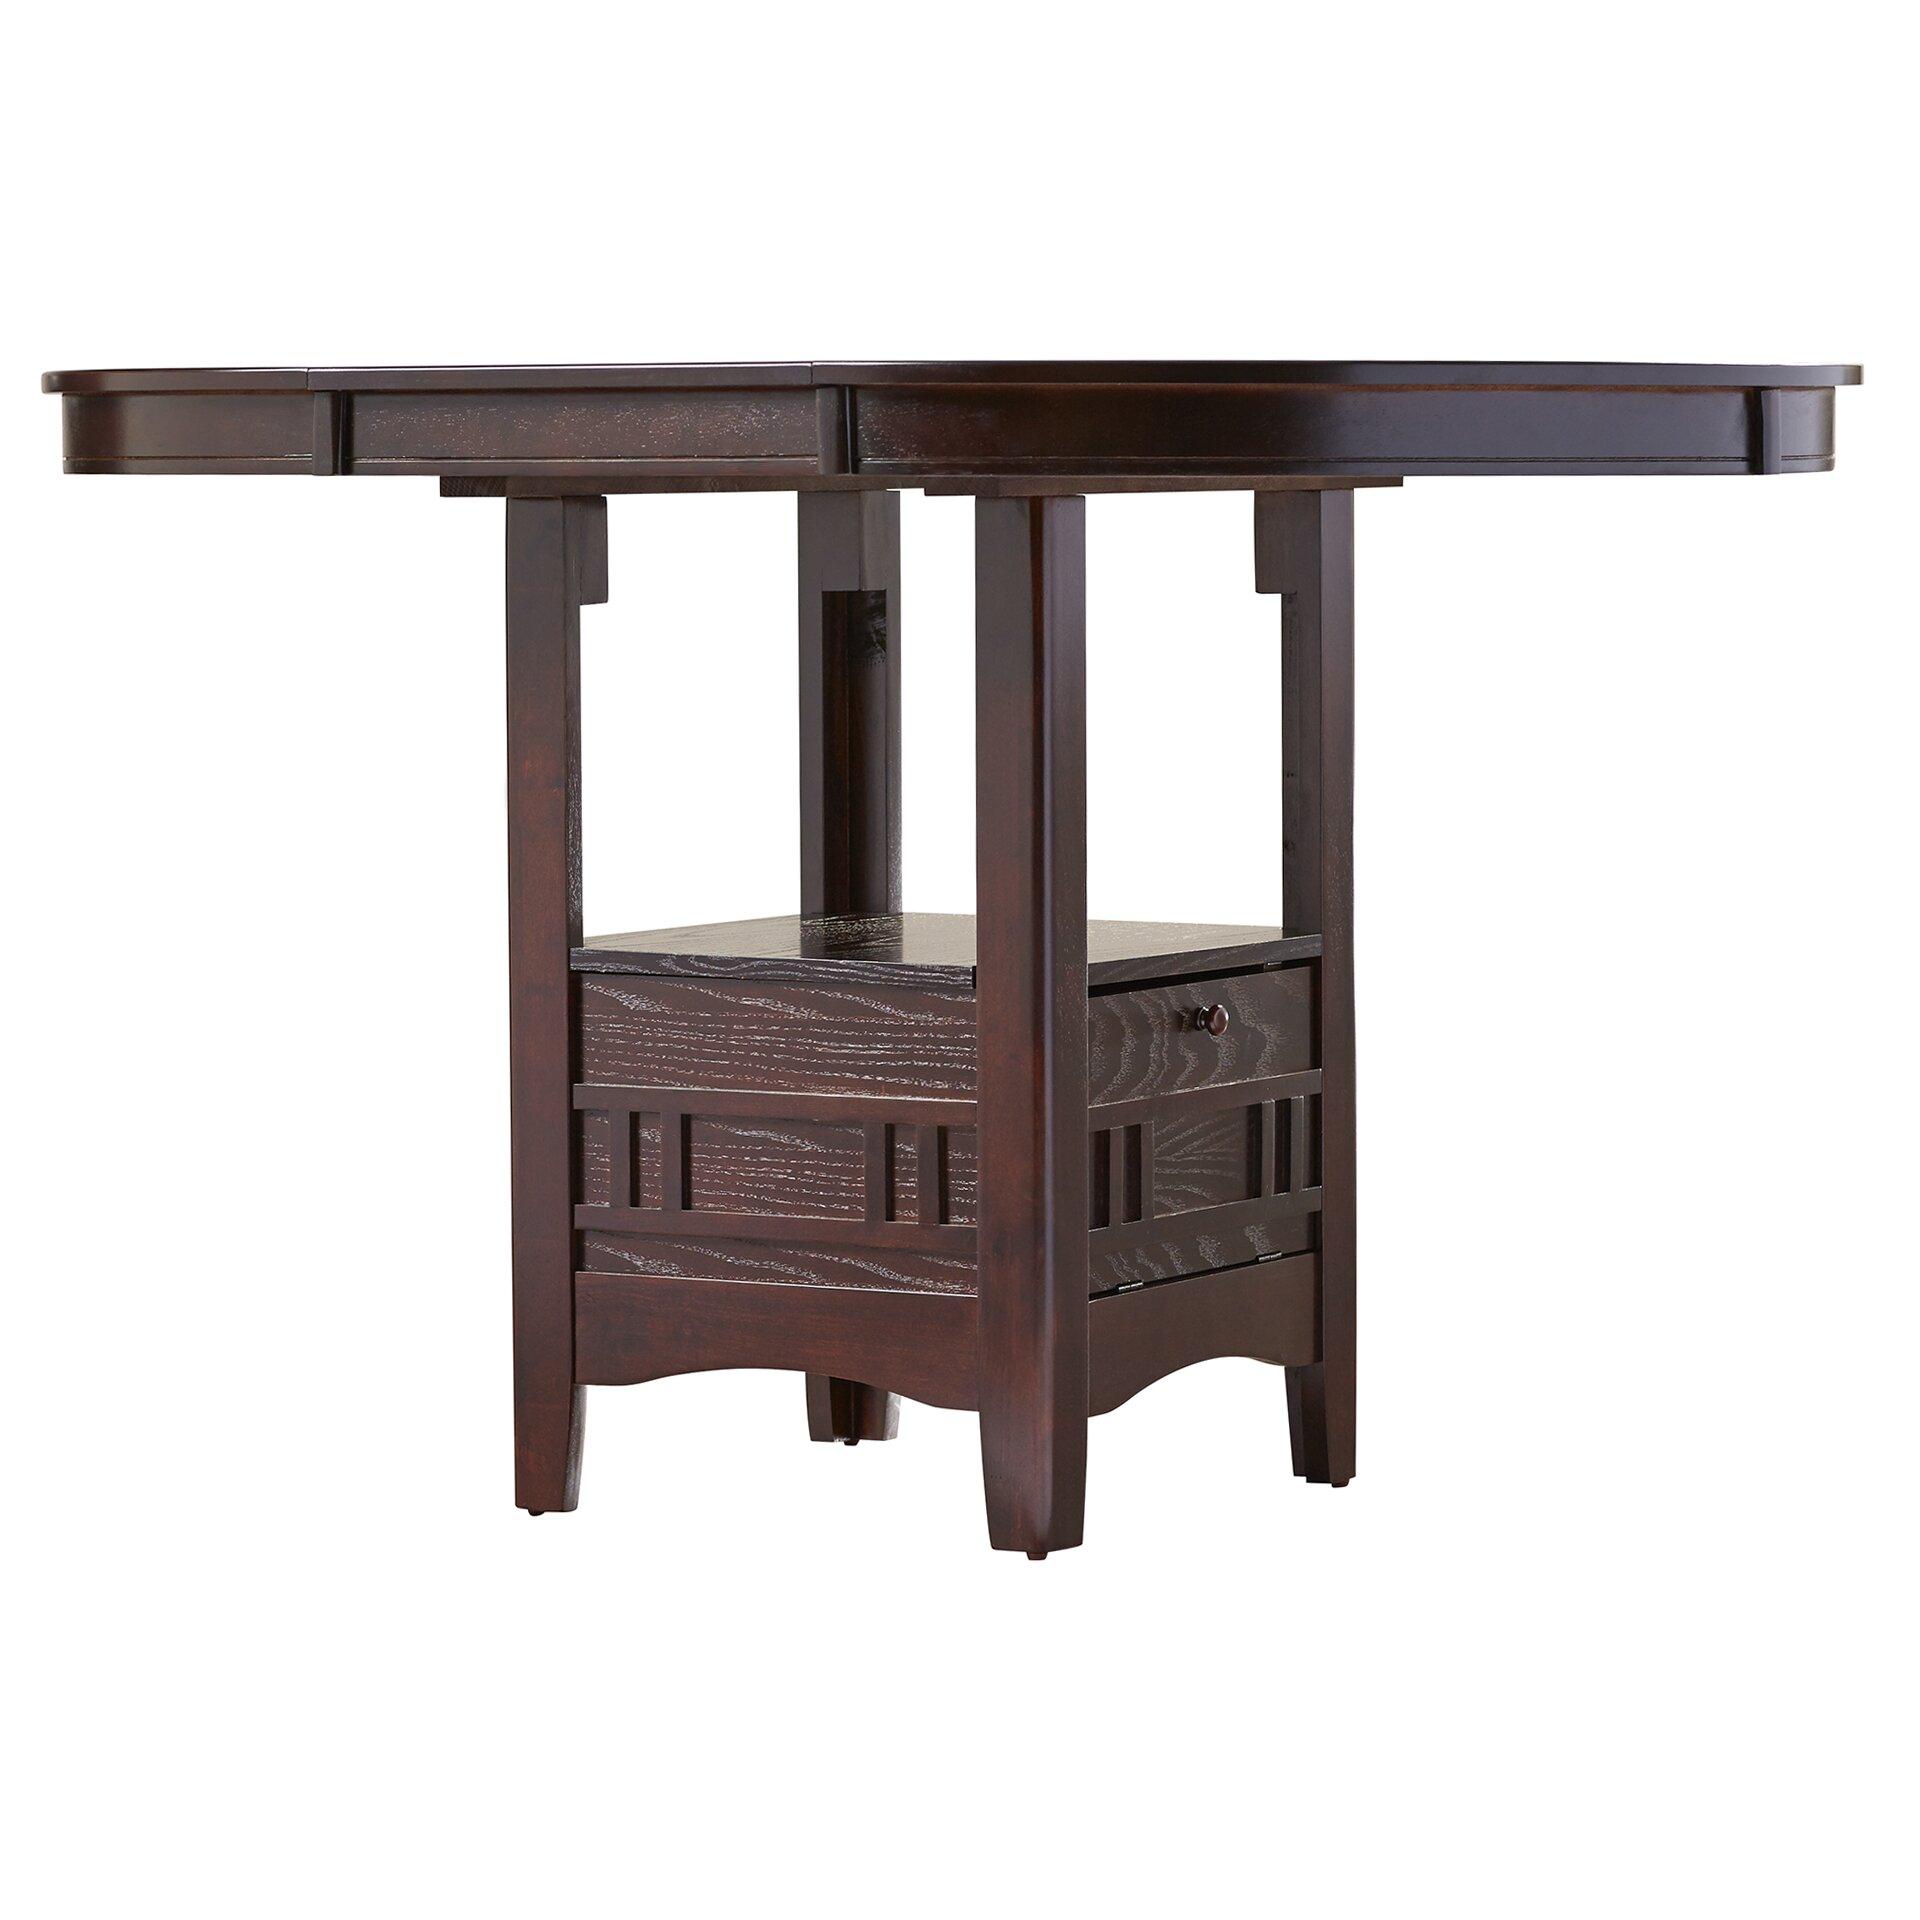 Alcott Hill Norwalk Counter Height Extendable Dining Table  : Alcott Hill Norwalk Counter Height Extendable Dining Table ALCT4995 from www.wayfair.com size 1920 x 1920 jpeg 254kB